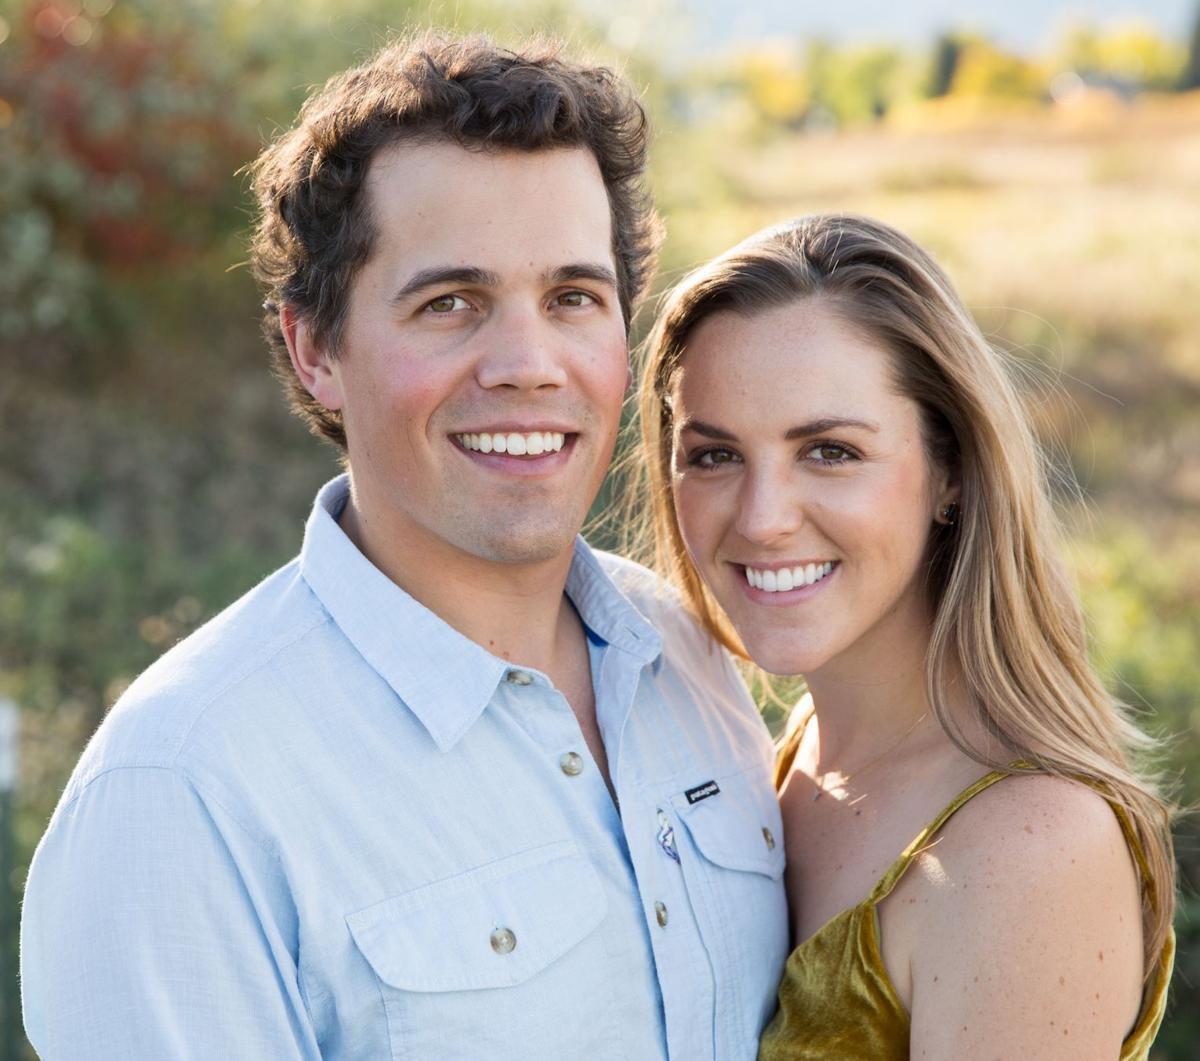 Scott Huennekens and Julie Crawford